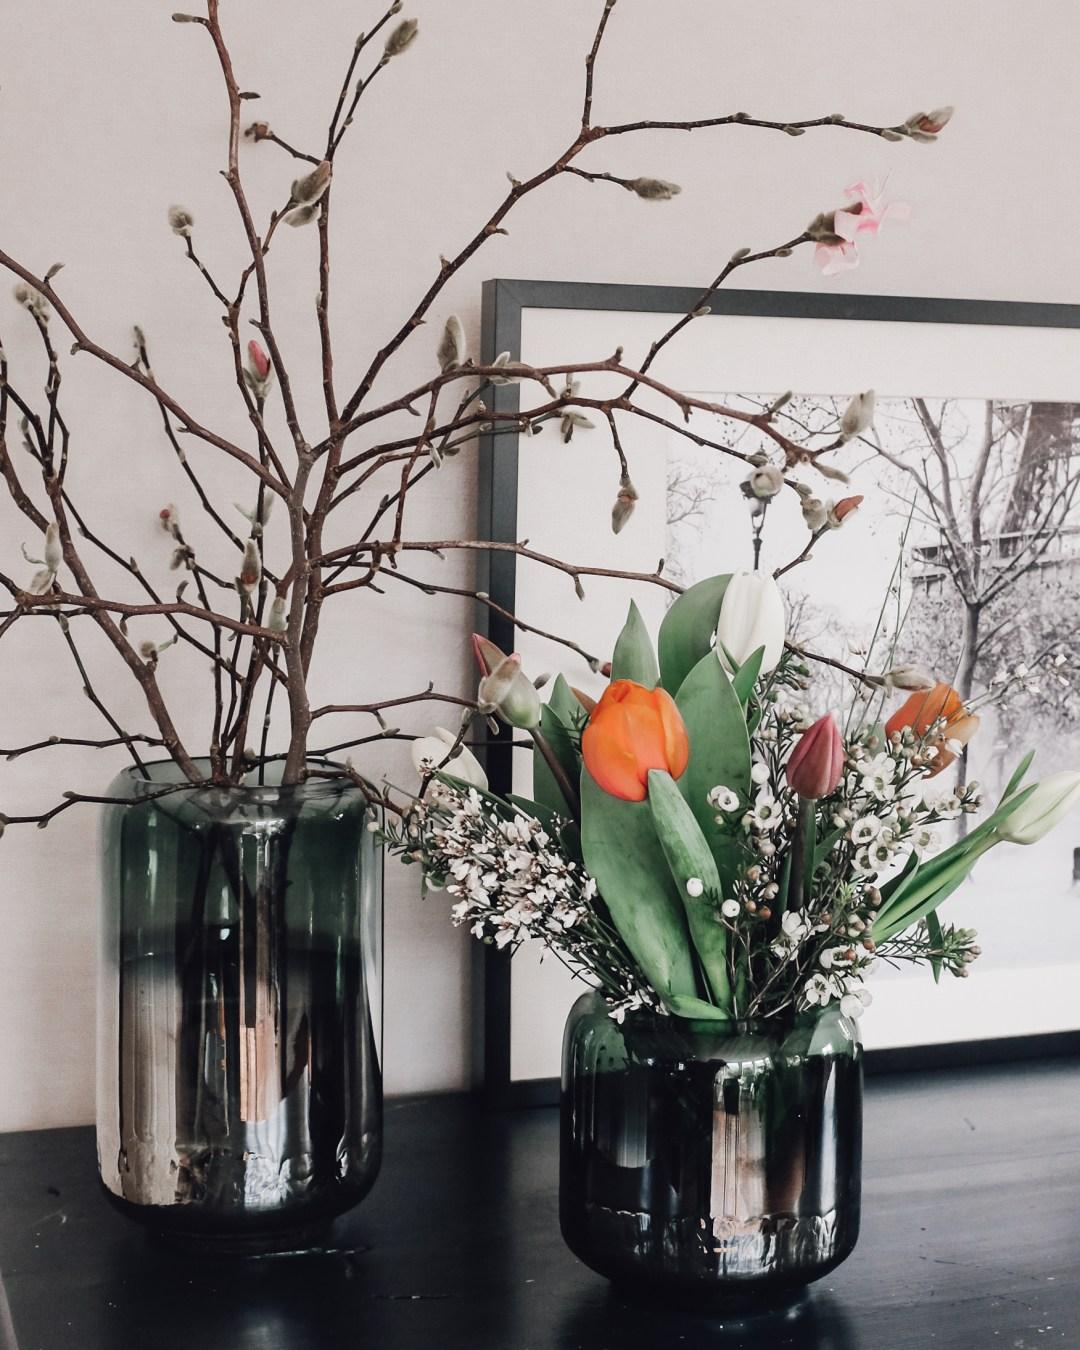 inastil, fühlingsdekoration, magnolien, Karomantel, Ü50Mode, Stylingtipps, Modeberatung, Übergangsmantel, Blazermantel, Hallein, Frühling-4